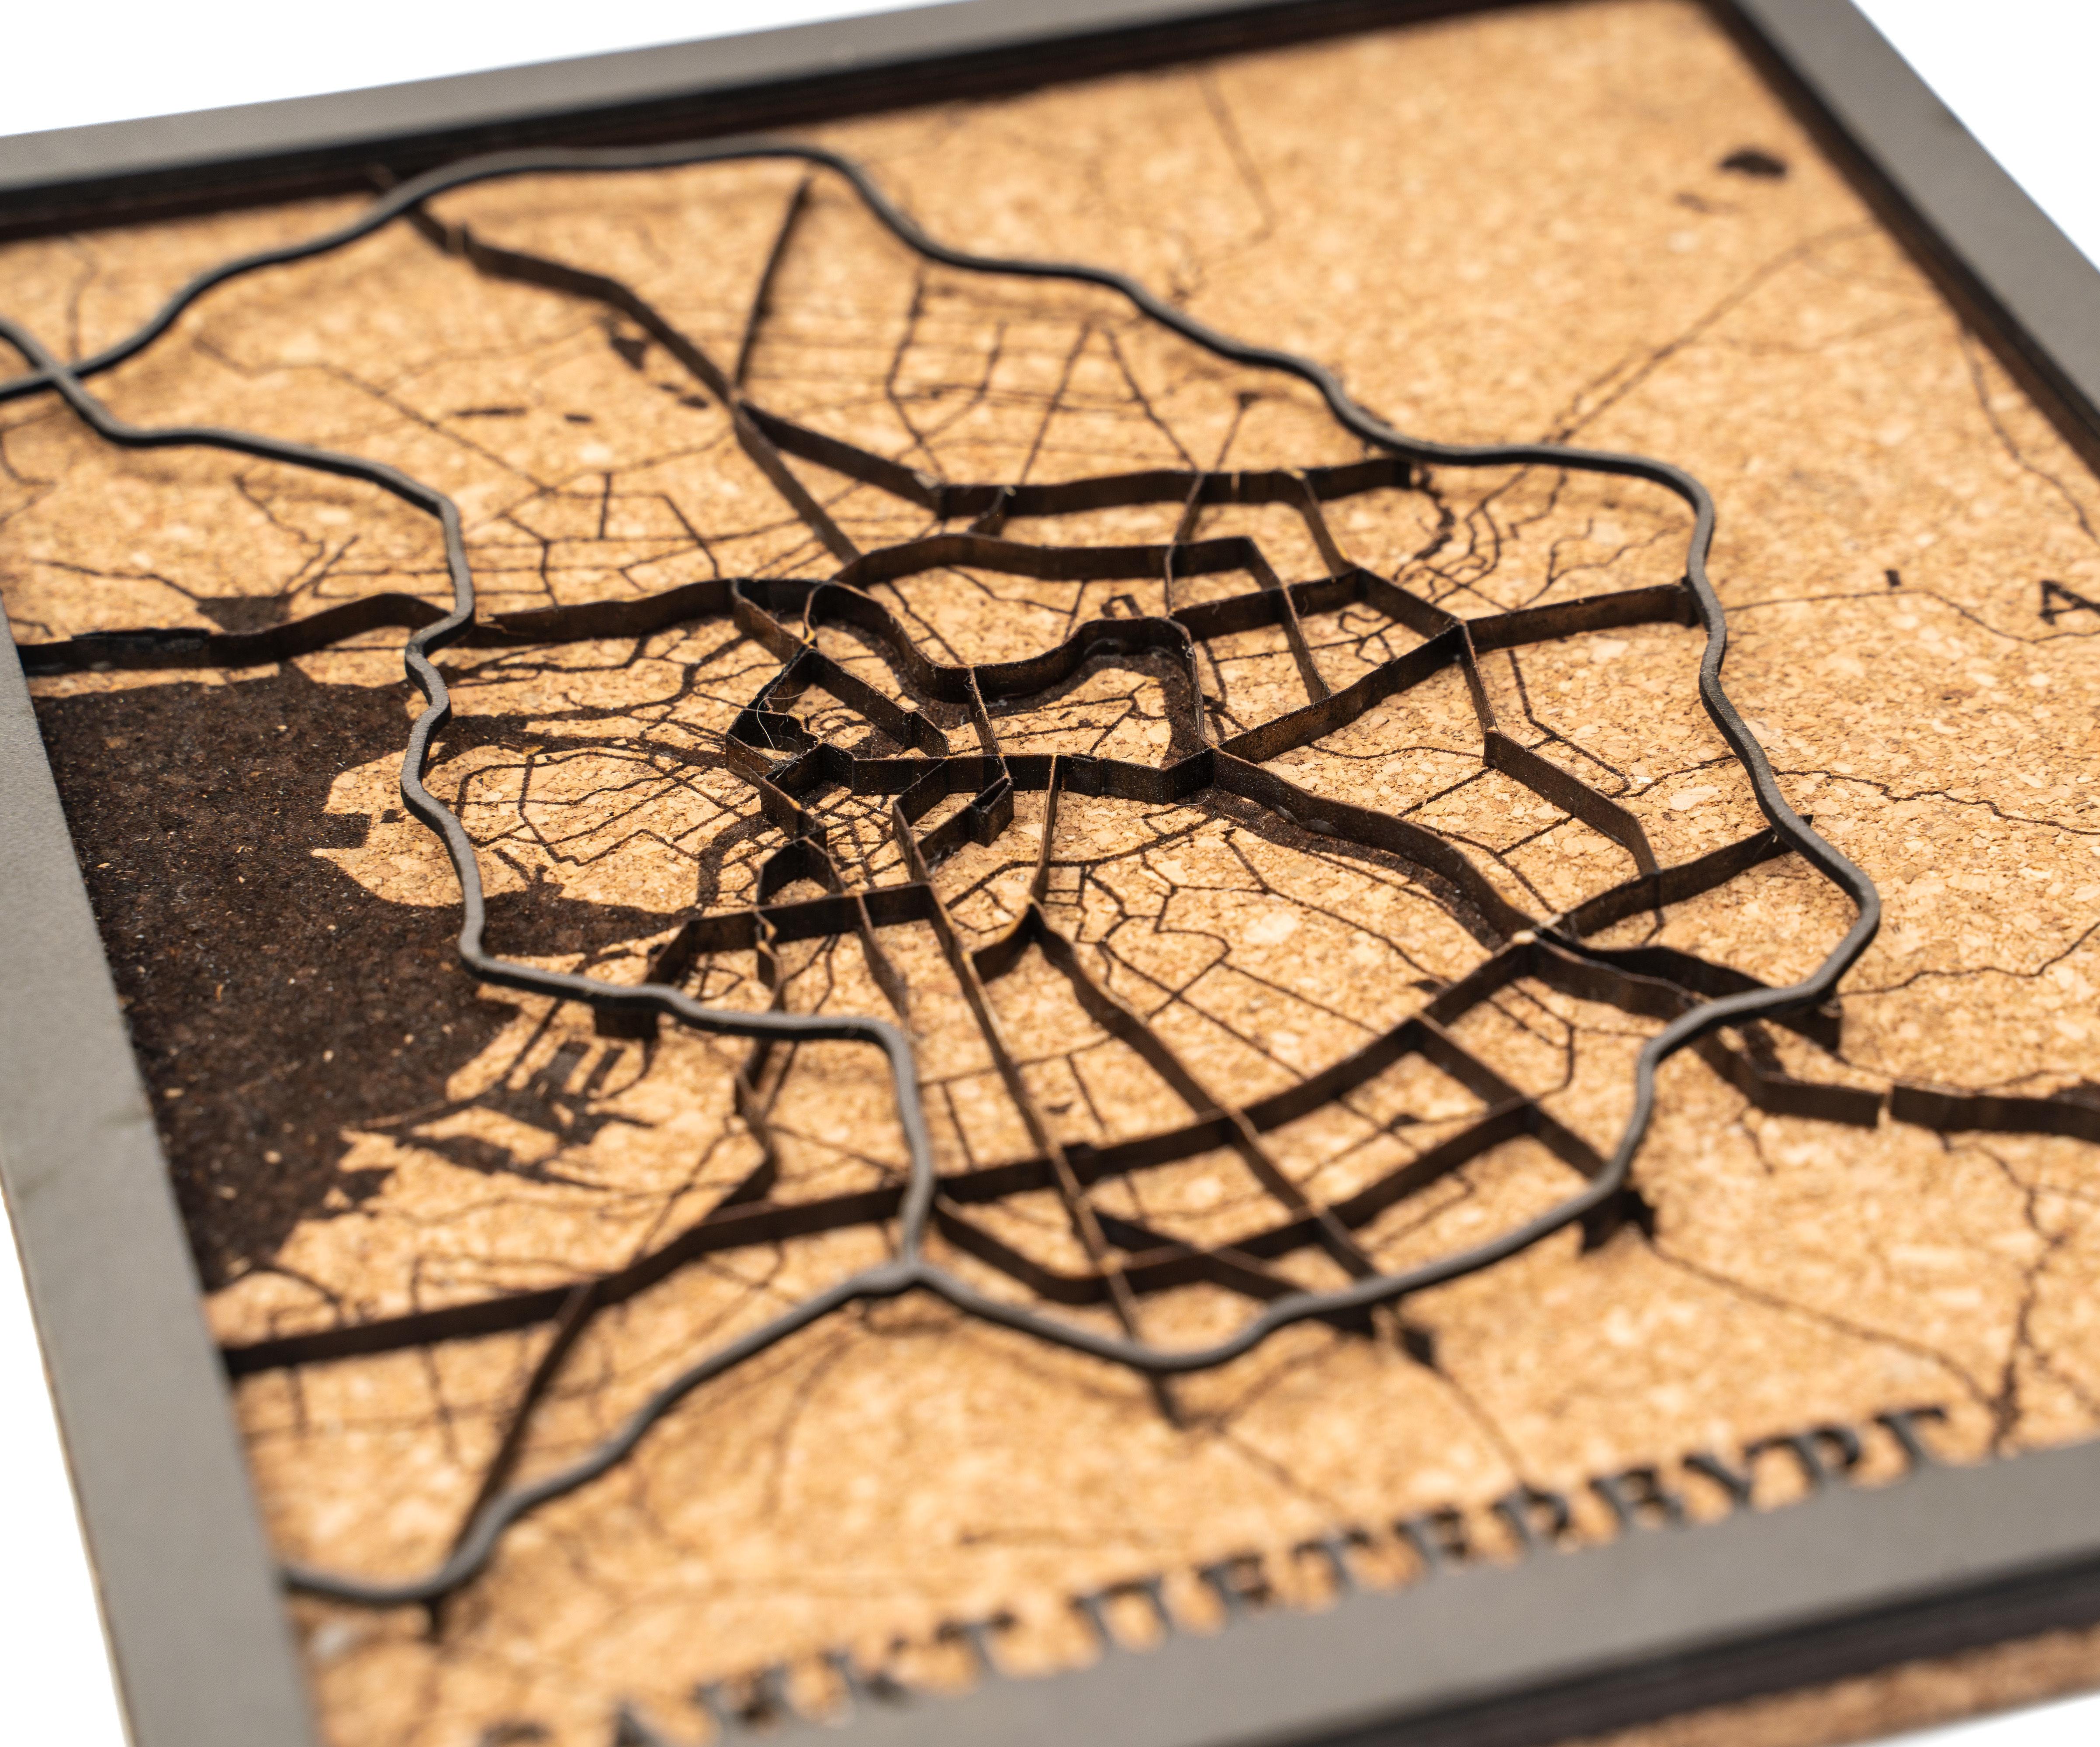 Saint-Petersburg Multi-layer Wooden Map